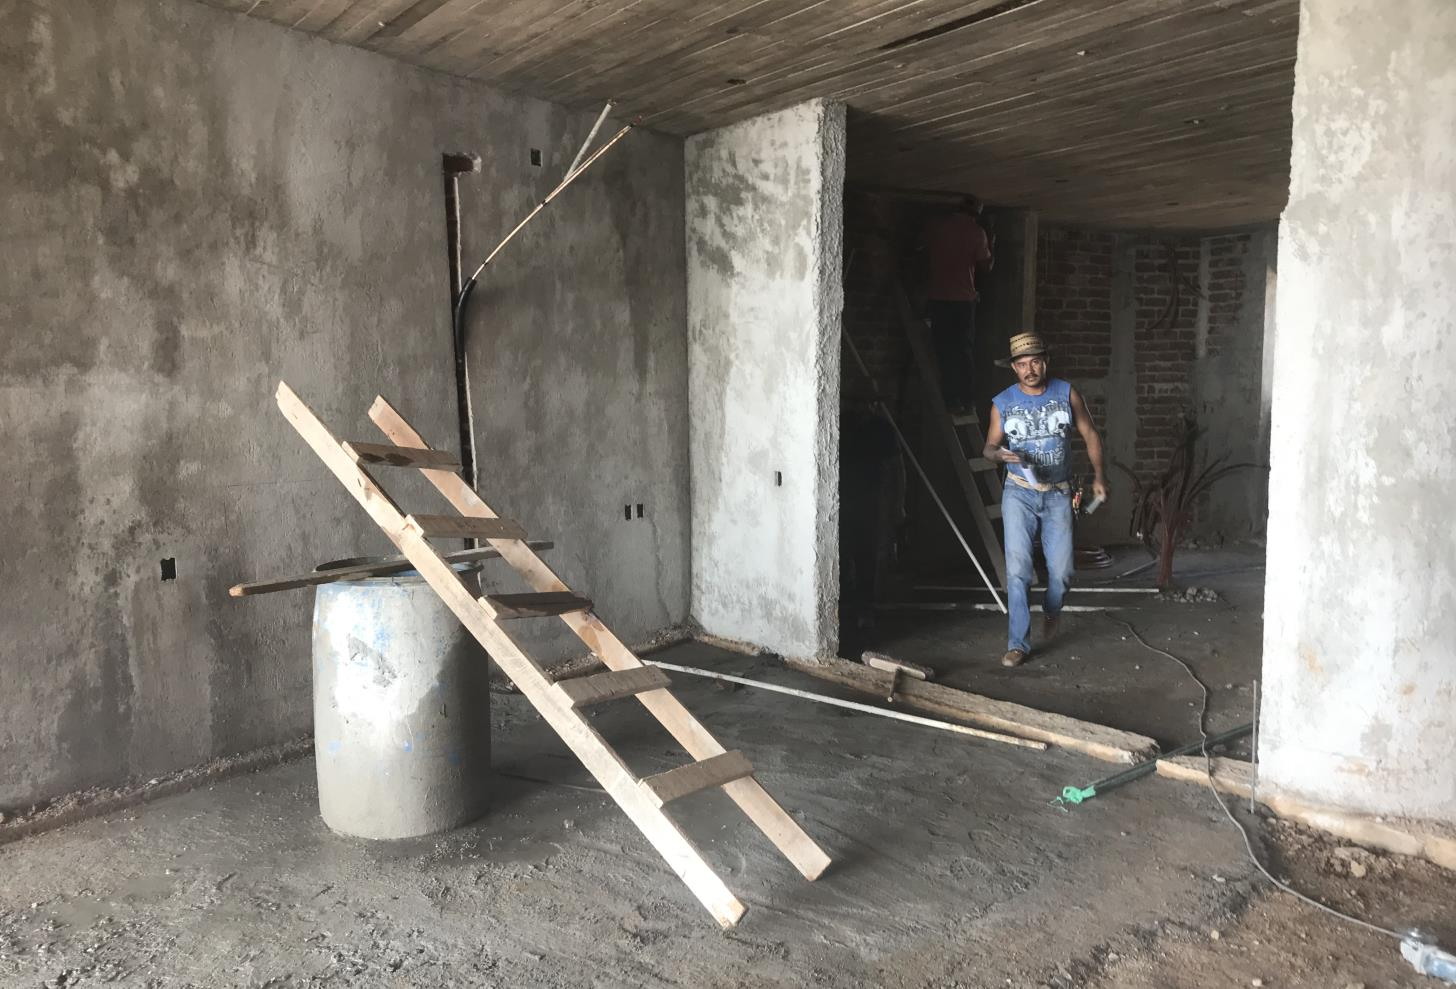 REPORTE-FOTOGRAFICO-PUNTA-MAJAHUA-09-DE-FEBRERO-DEL-2018-032.jpg